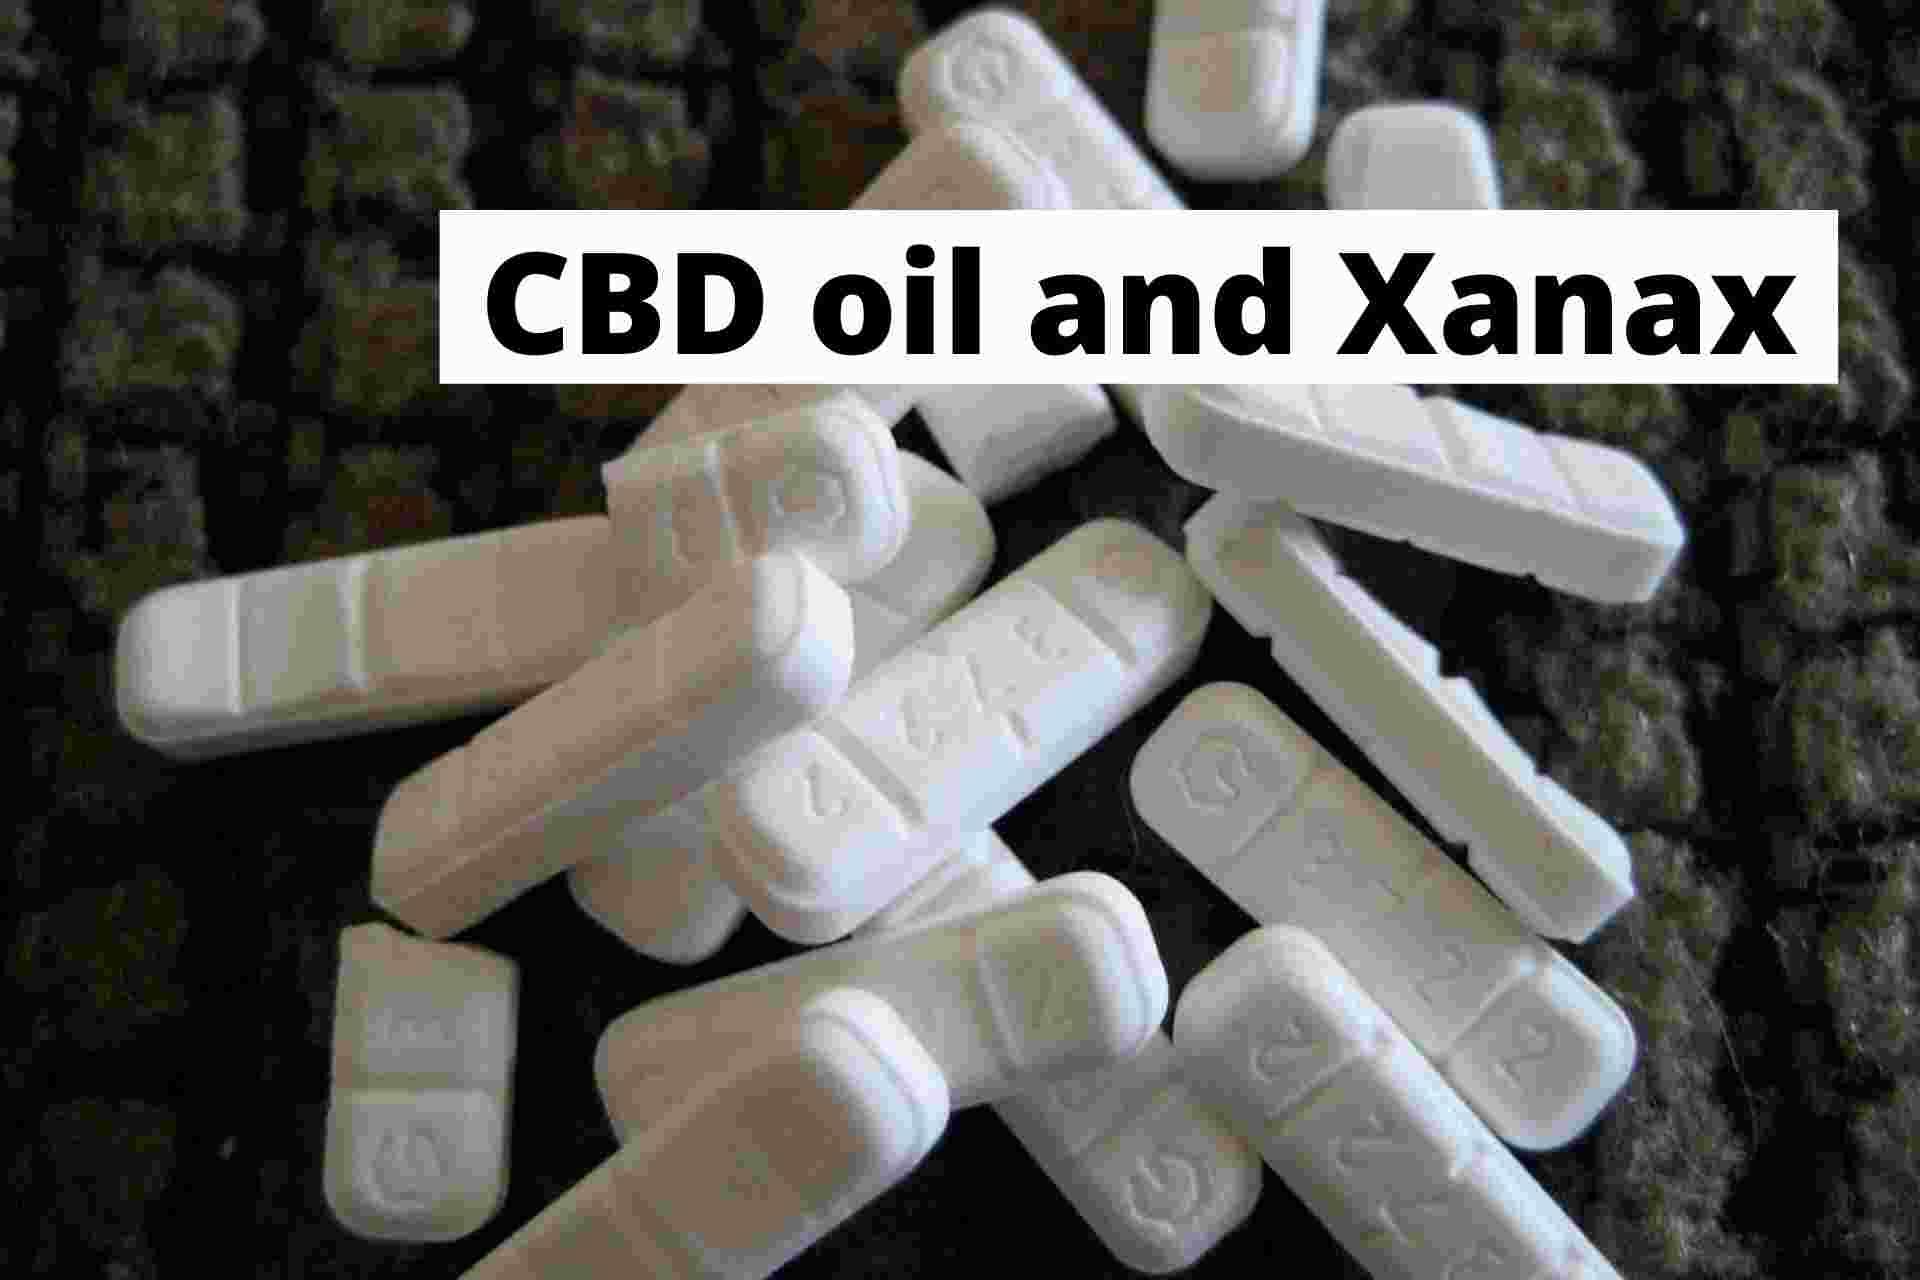 CBD oil and Xanax